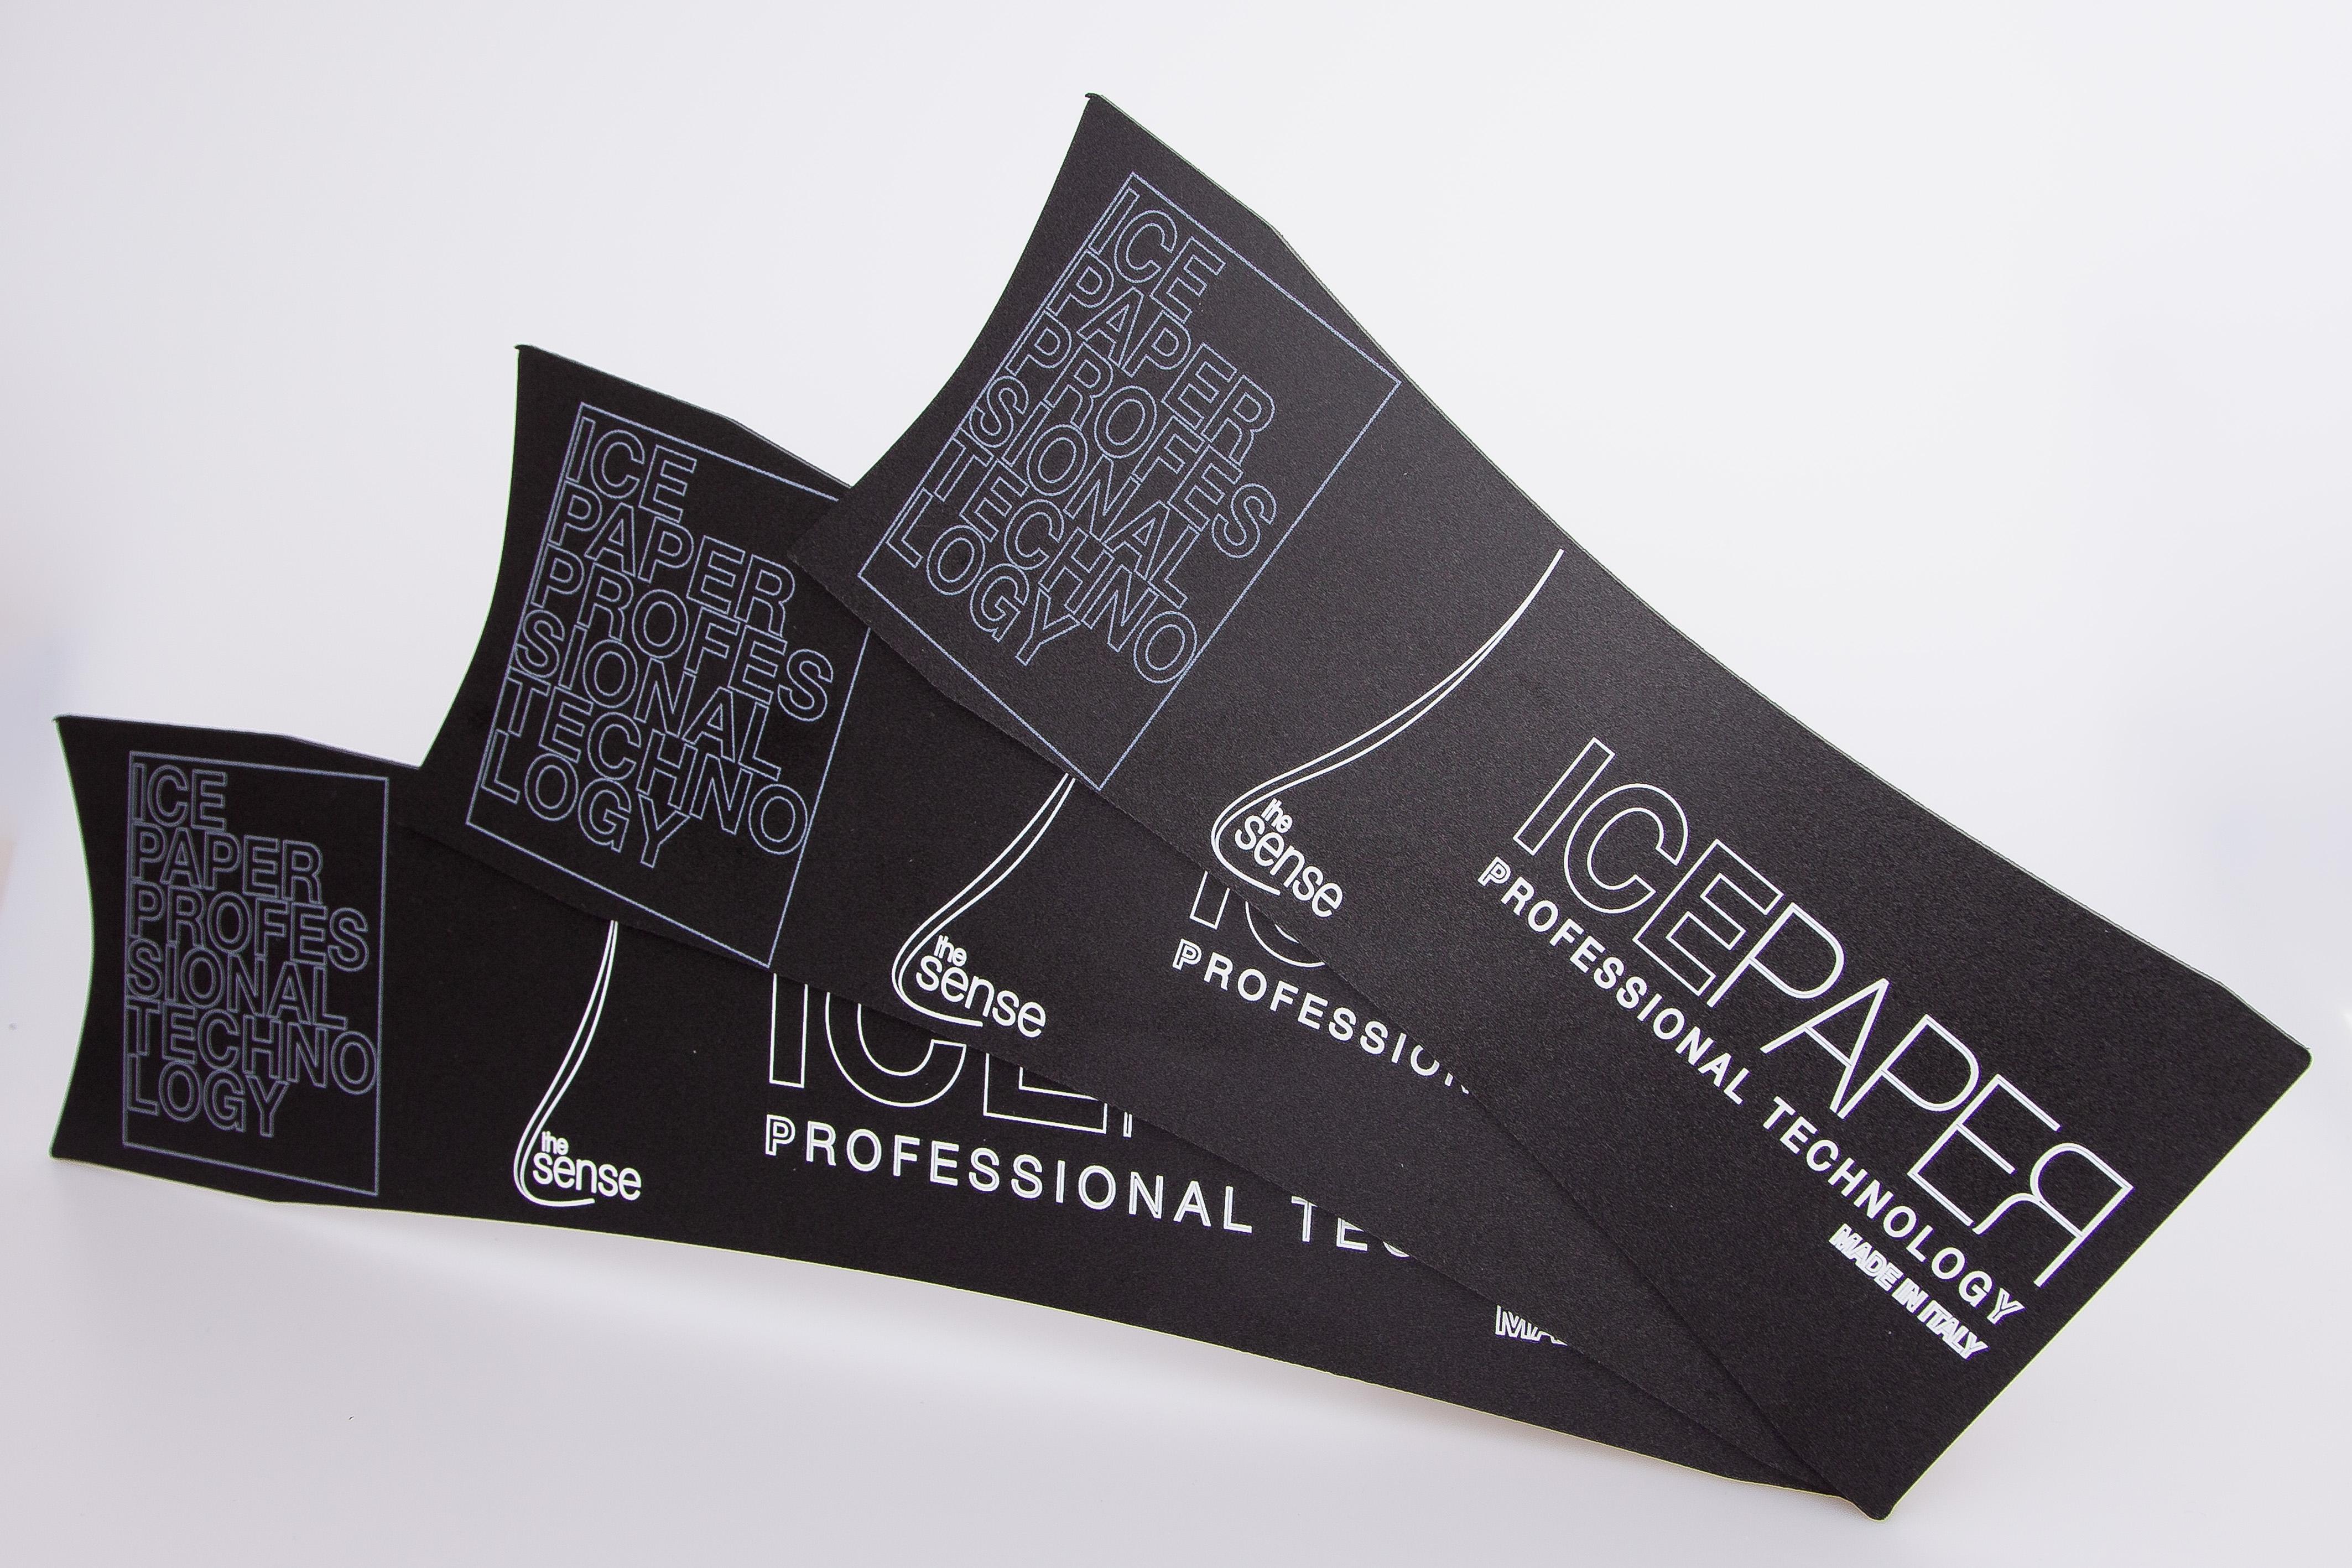 Tris Spatole Ice Paper-Spatole per meches